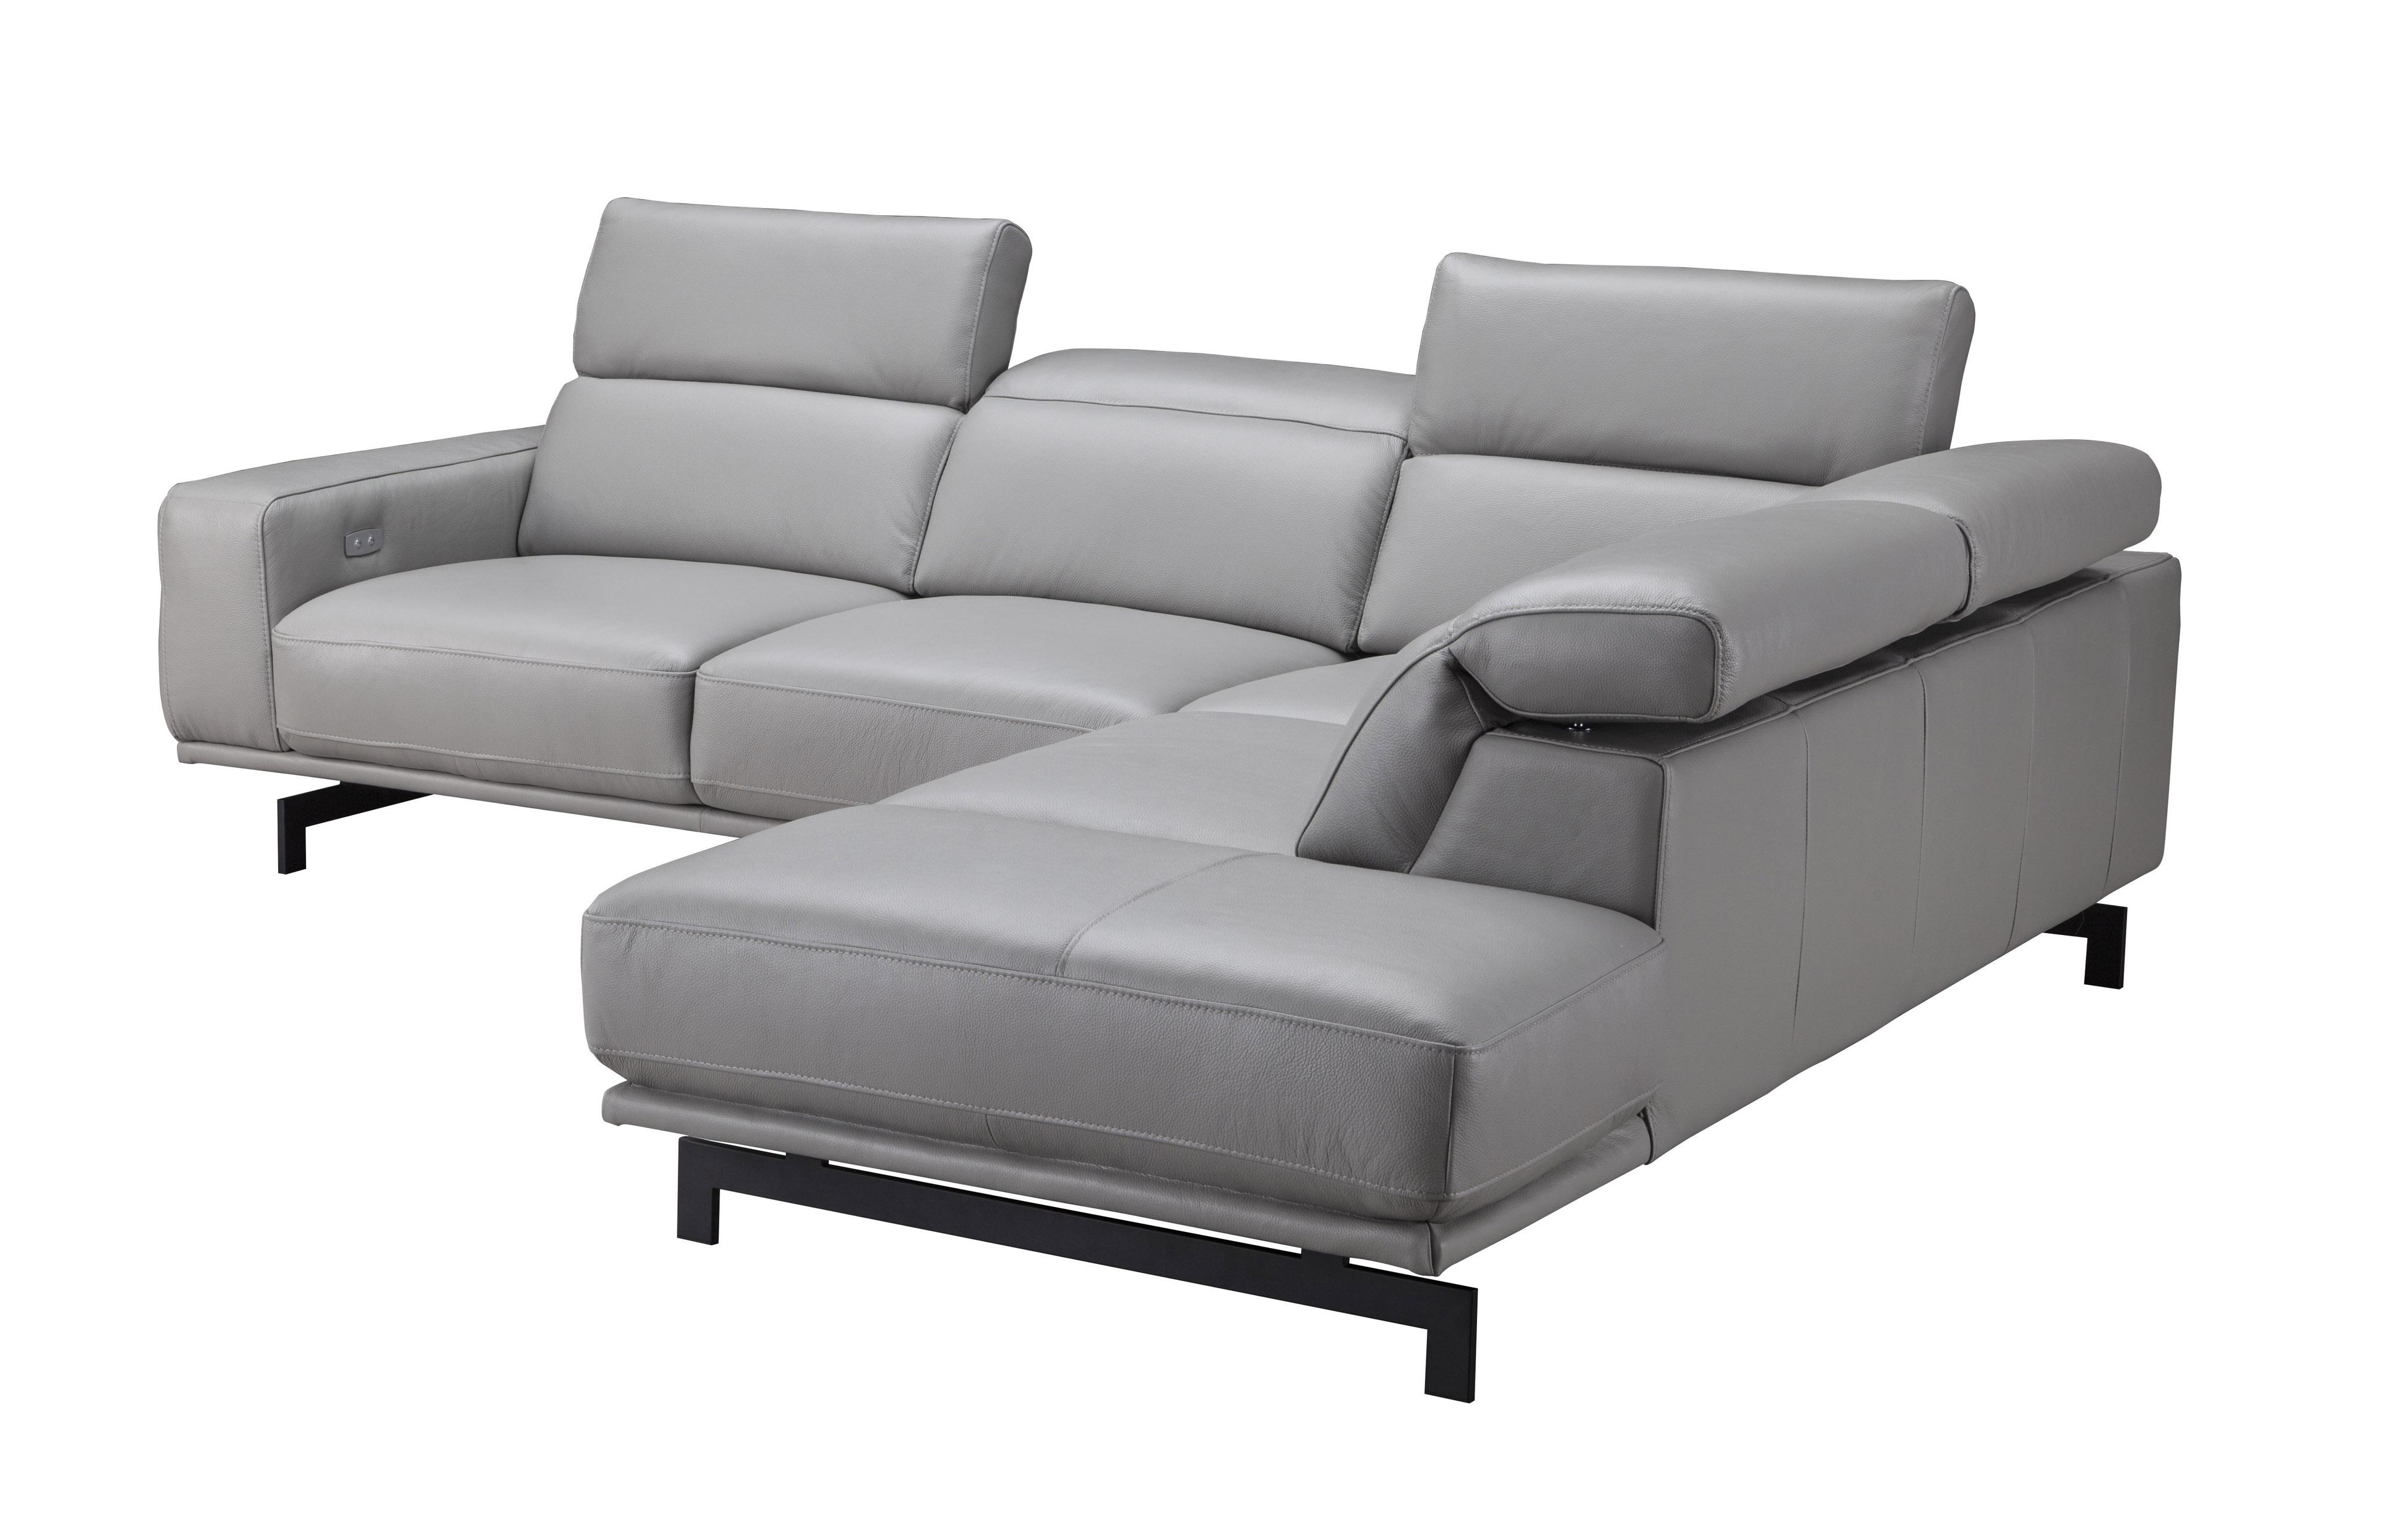 Phenomenal Adjustable Advanced Italian Top Grain Leather Sectional Sofa Theyellowbook Wood Chair Design Ideas Theyellowbookinfo